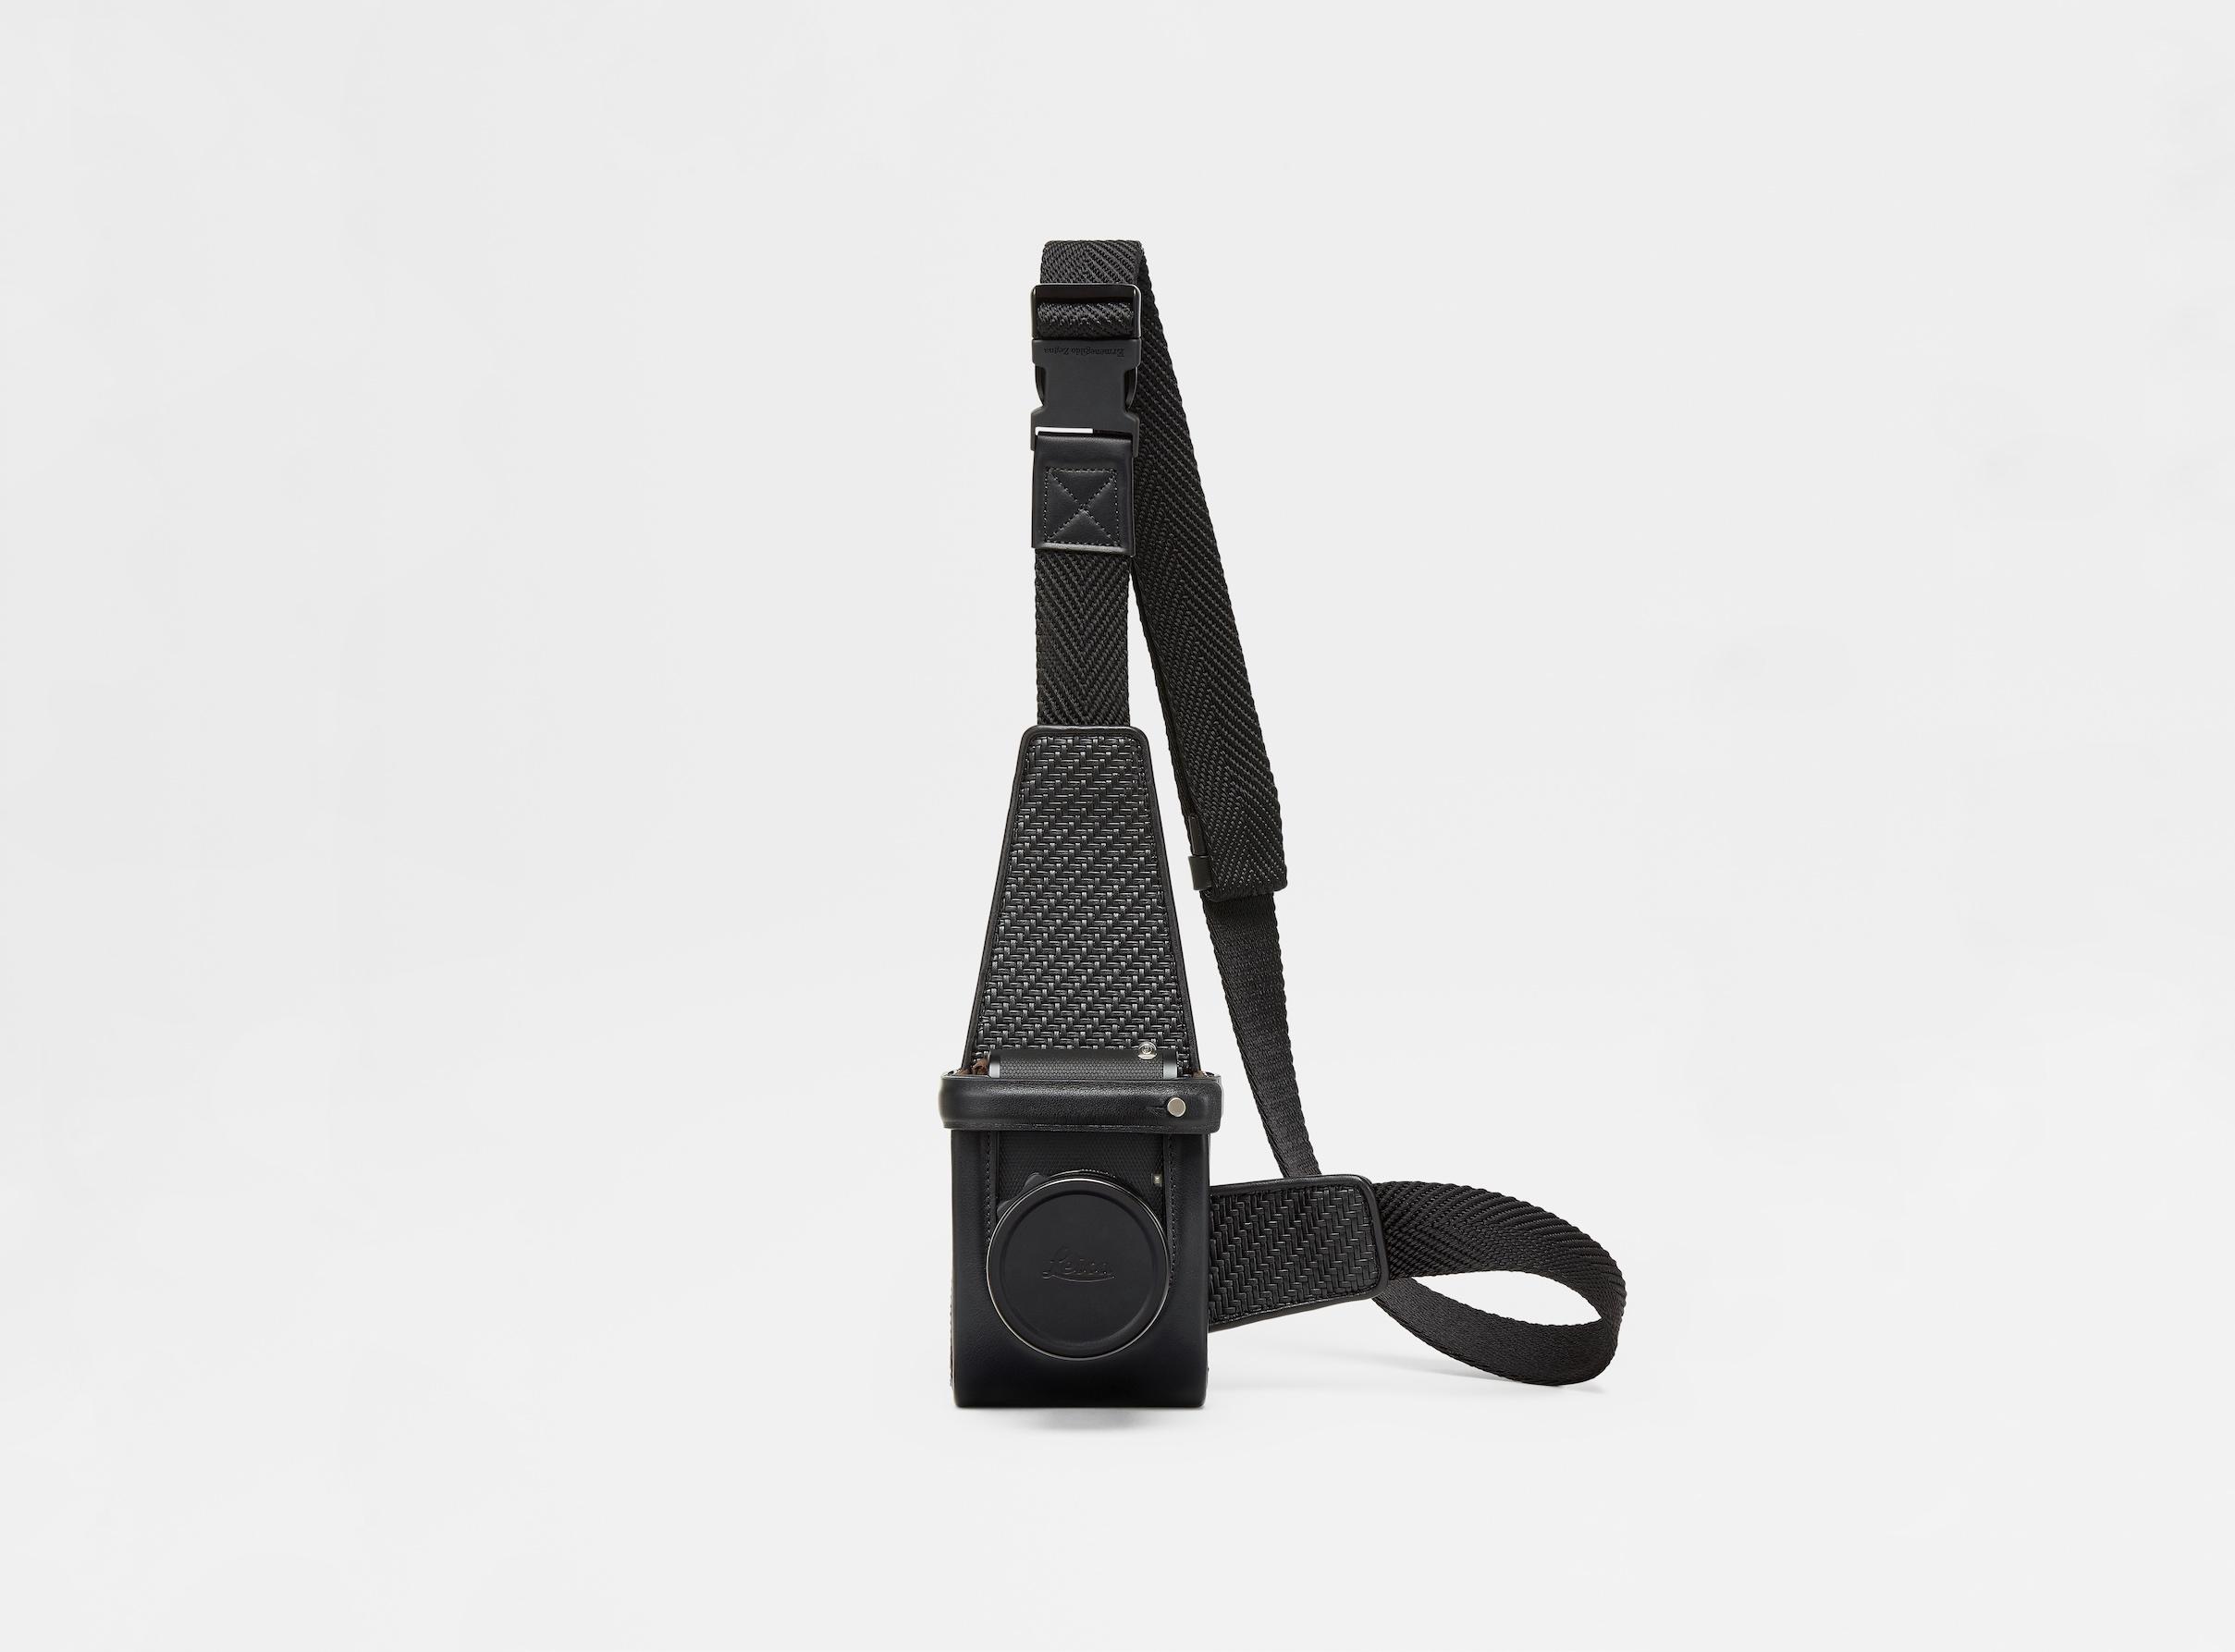 Ermenegildo Zegnaの独自生地採用 Leicaとラグジュアリーなカメラアクセサリー発売